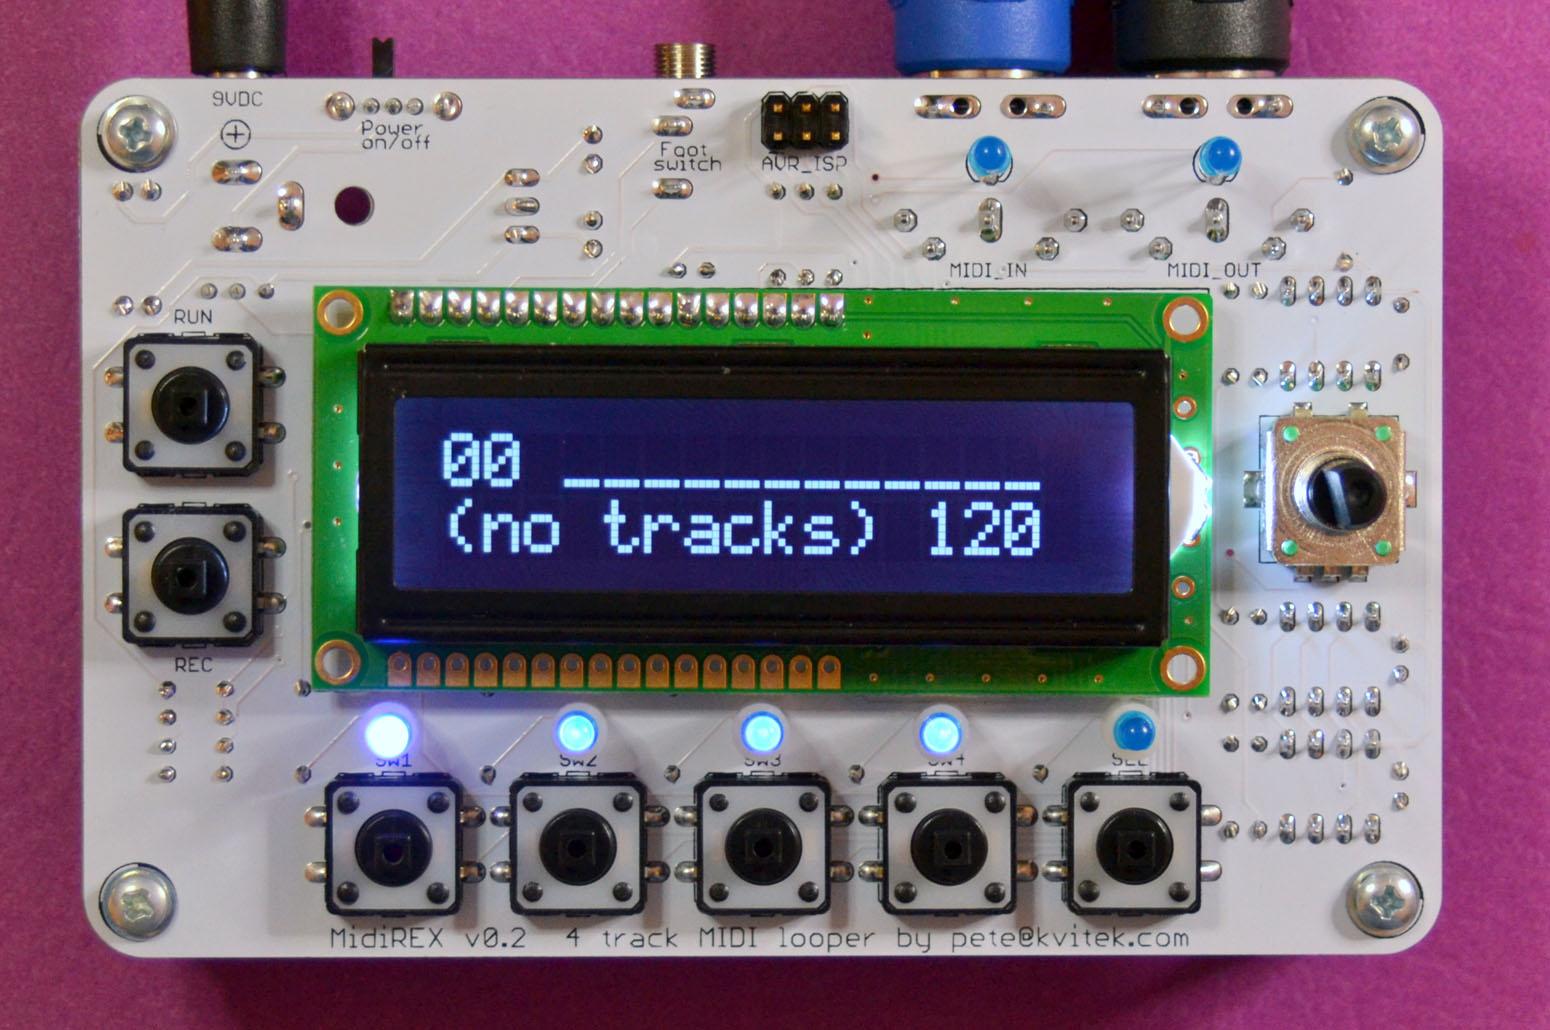 Midirex Diy Midi Loop Sequencer The Incubator Mutable Strange Led Instruments Community